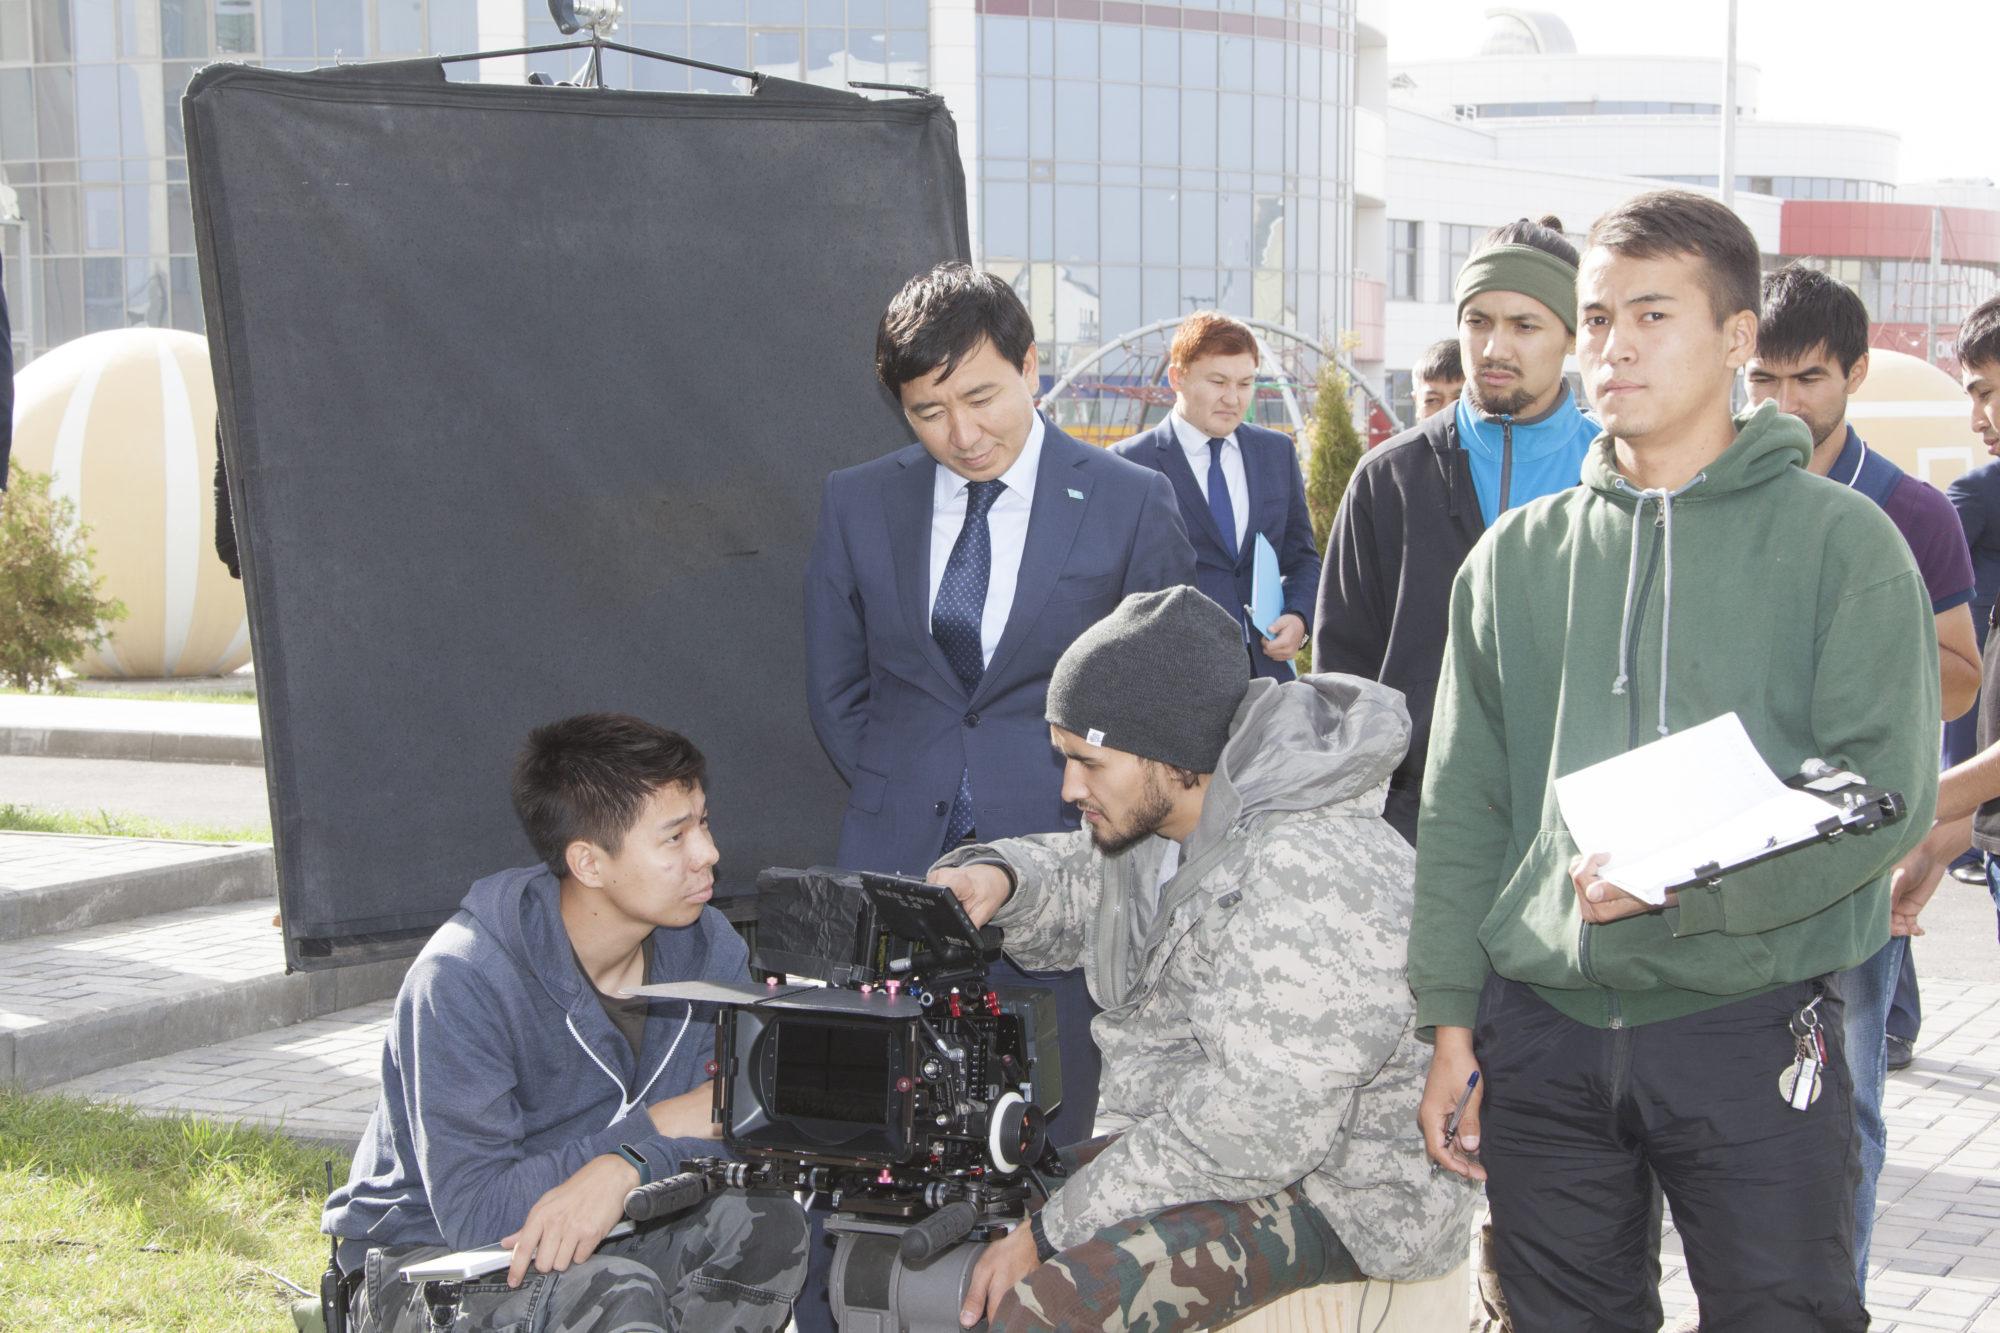 Алматинская область, Welcome to Zhetysu, съемки фильма